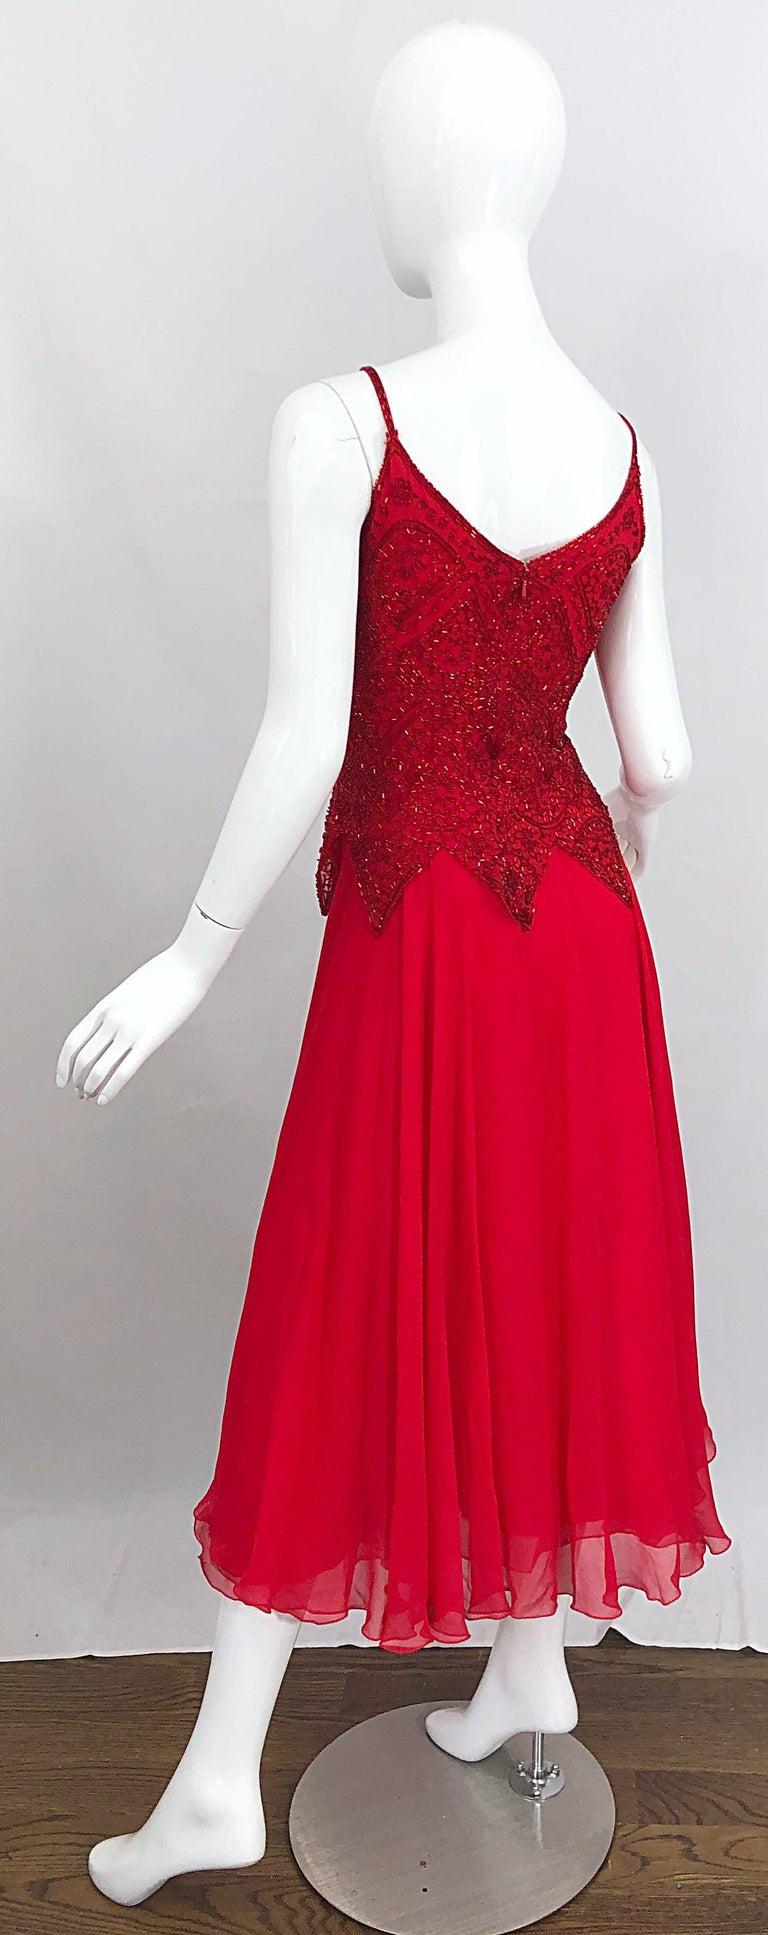 1970s Oleg Cassini Size 10 / 12 Red Silk Chiffon Beaded Handkerchief Midi Dress For Sale 9